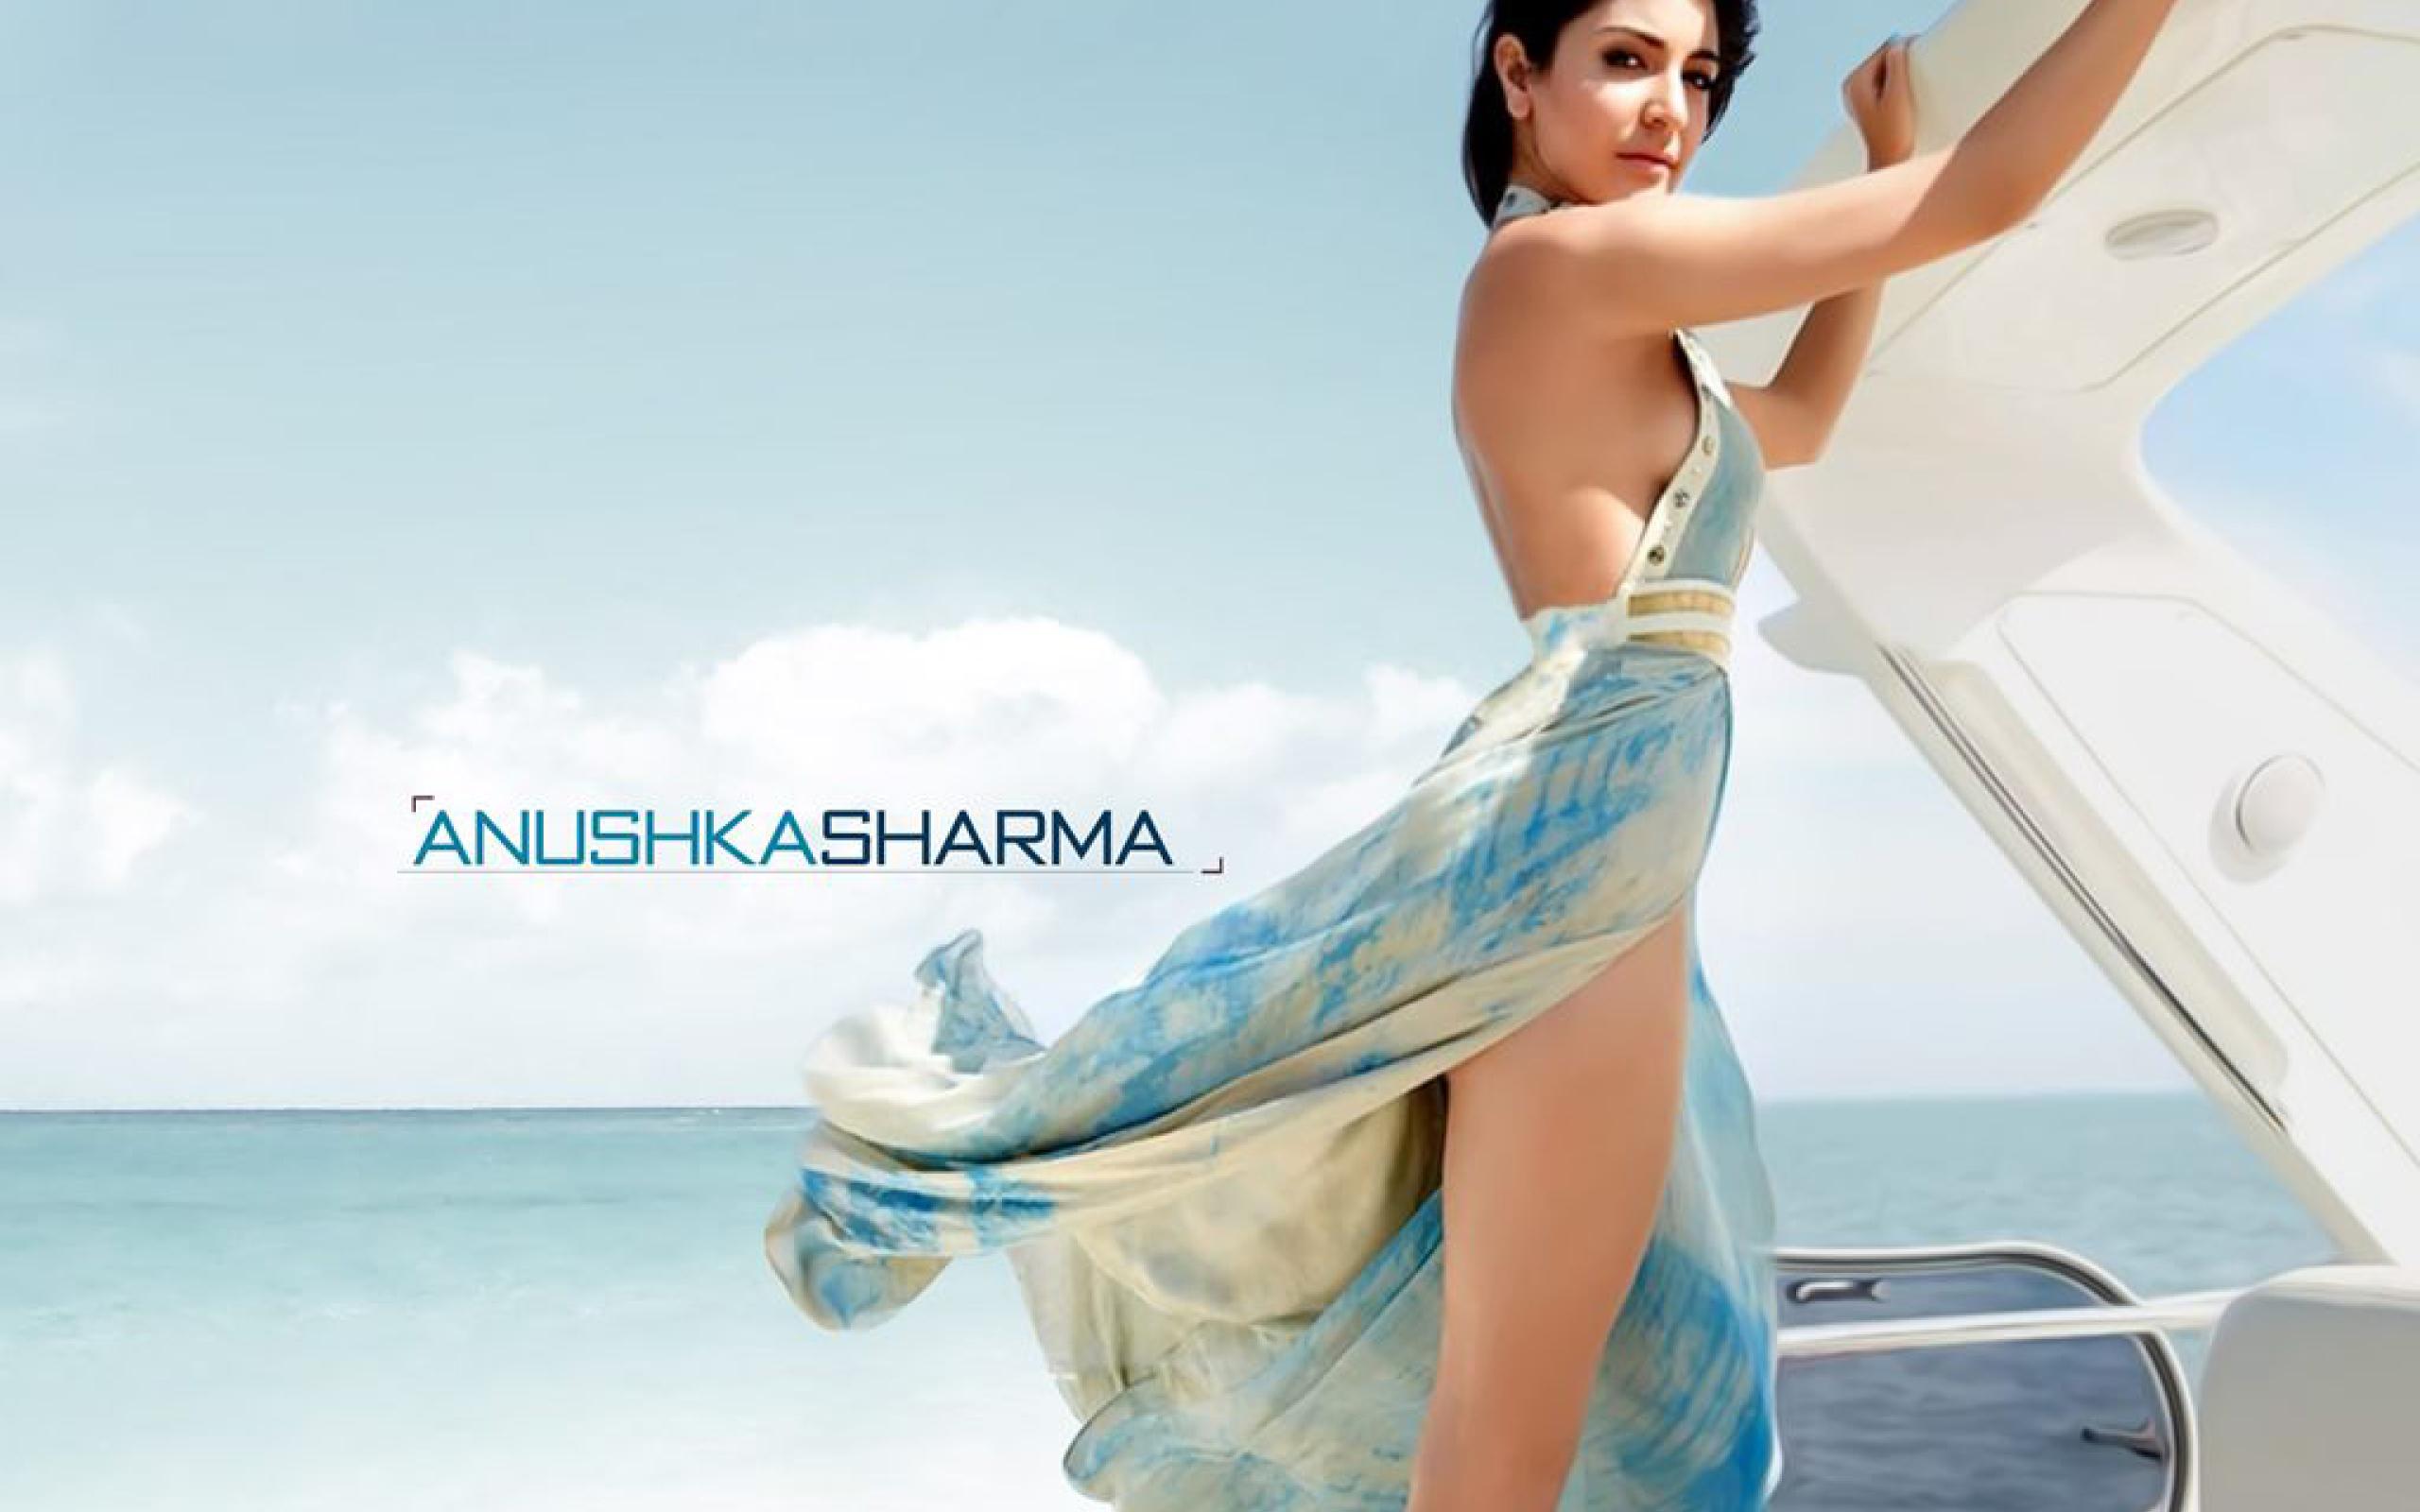 anushka-sharma-xx-hood-image-charlie-erica-and-allyson-handjob